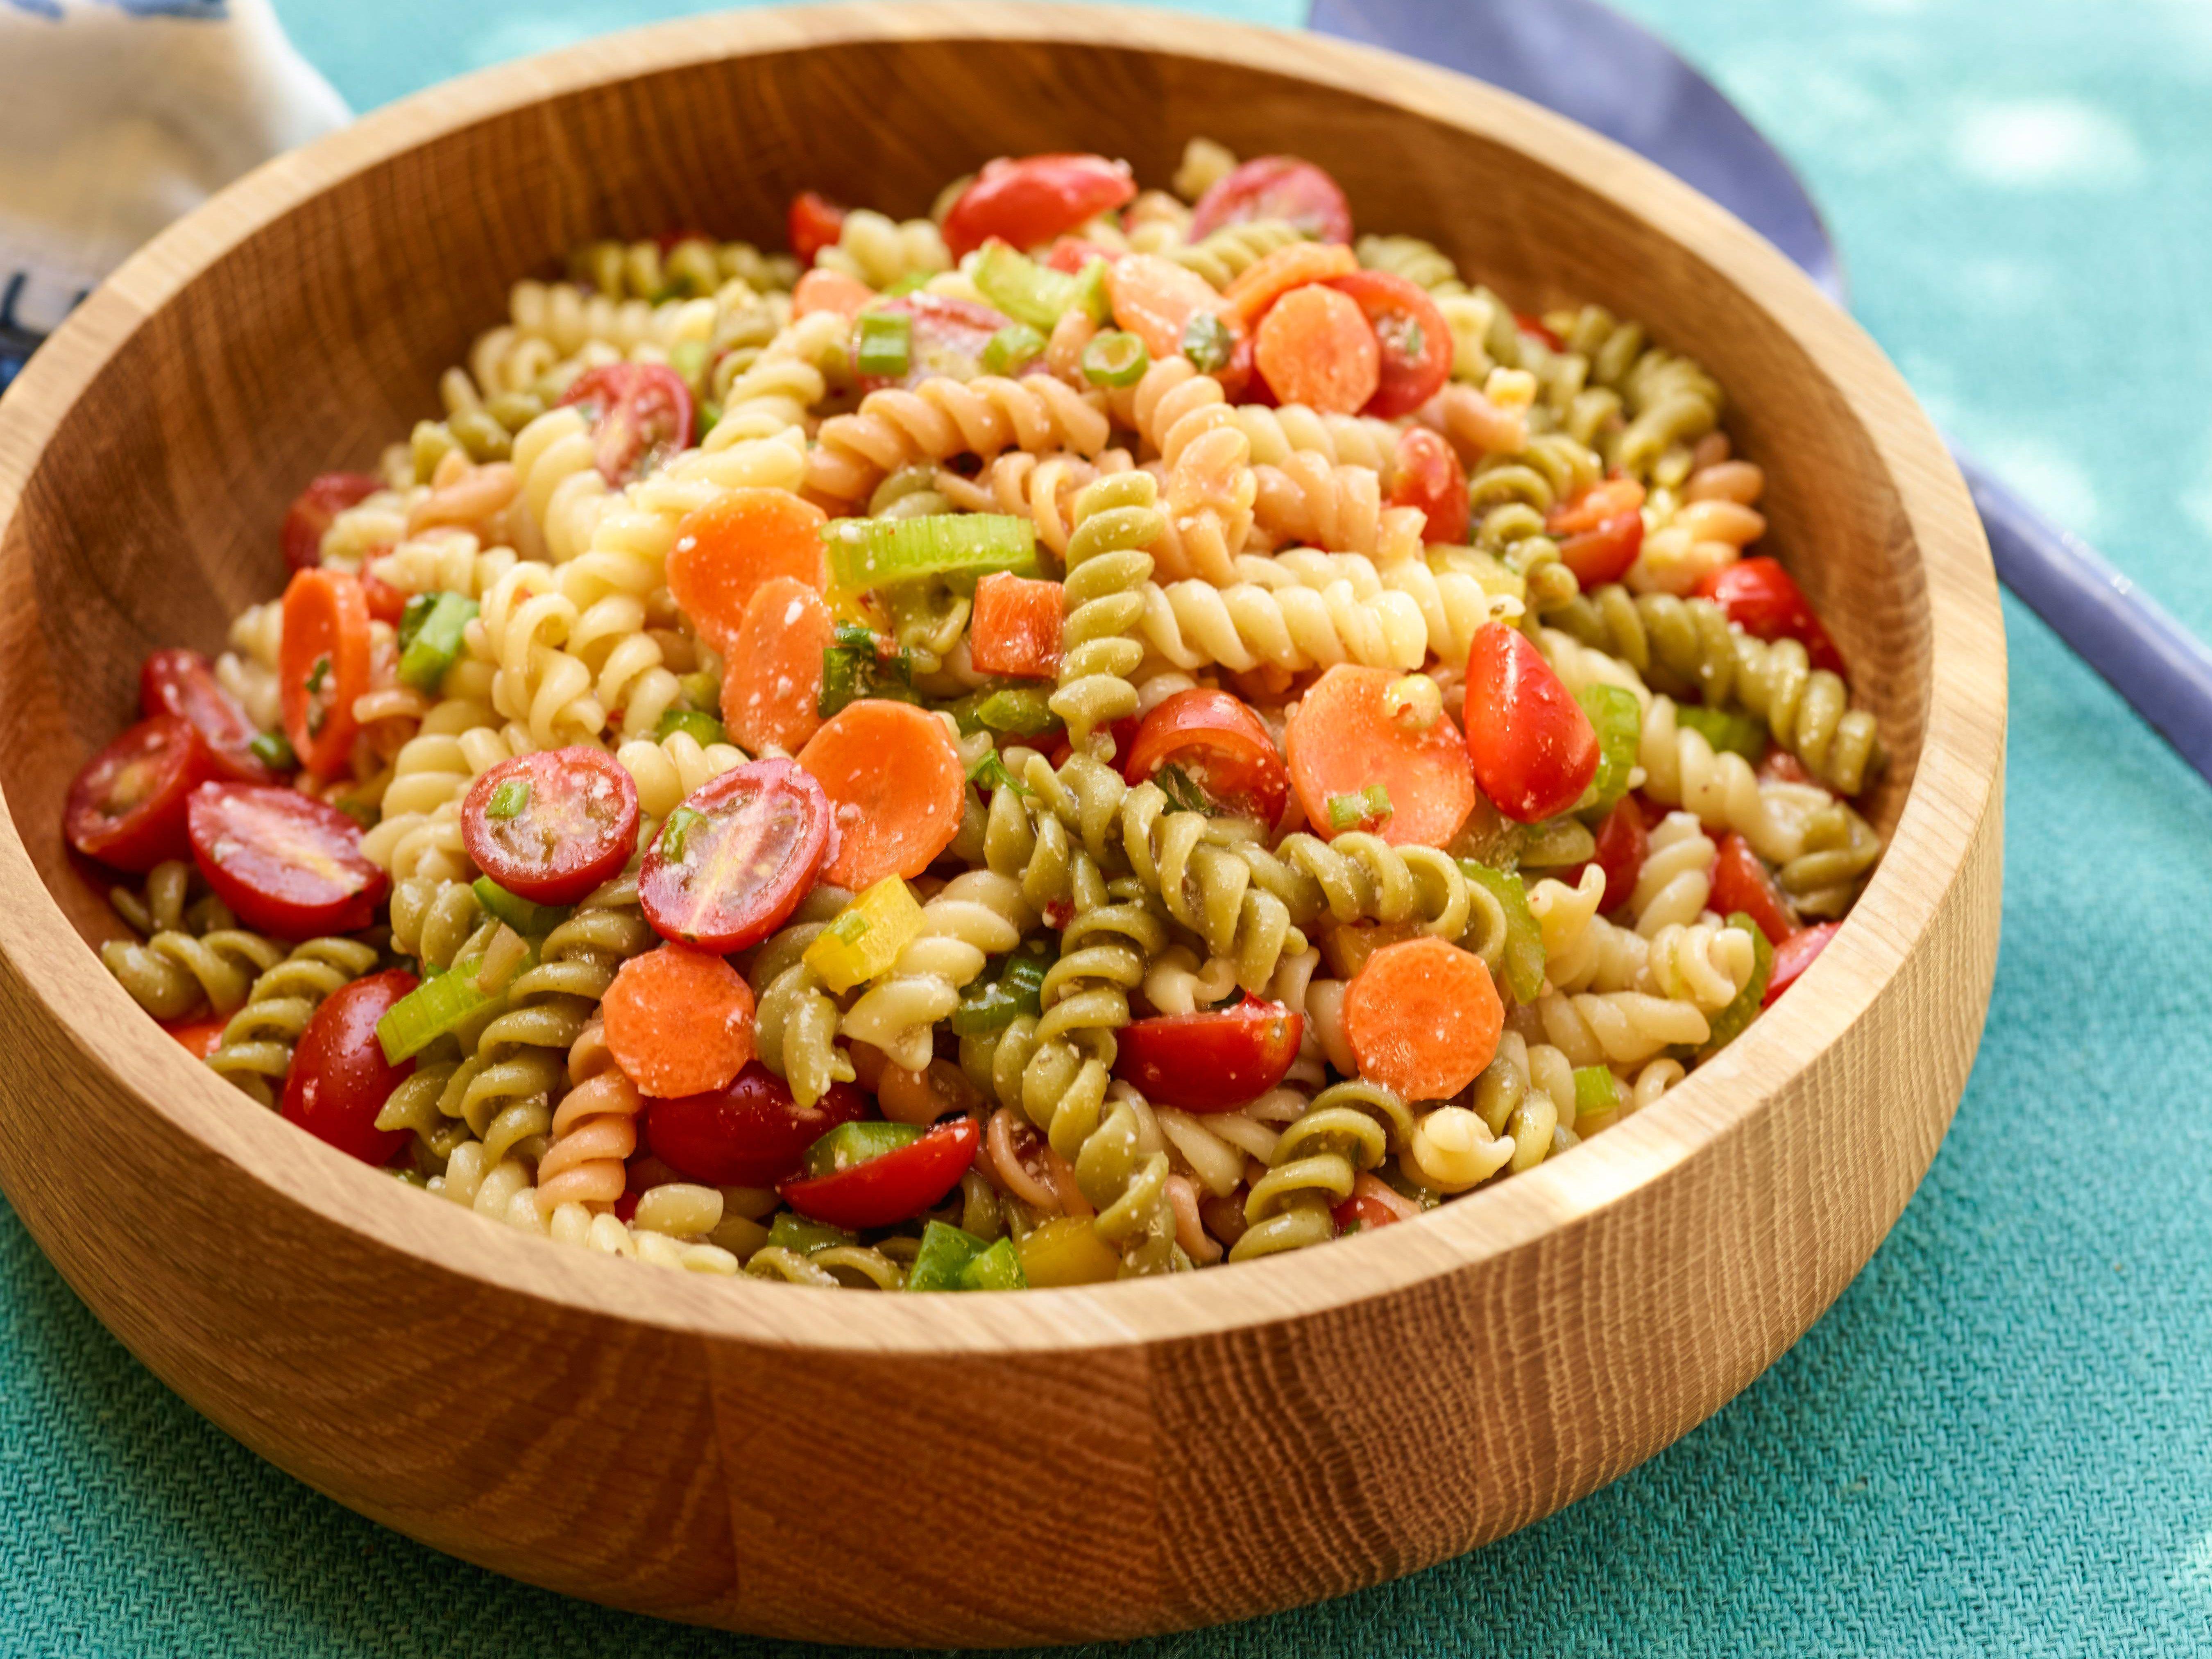 Garden pasta salad recipe pasta salad pasta and salad forumfinder Gallery